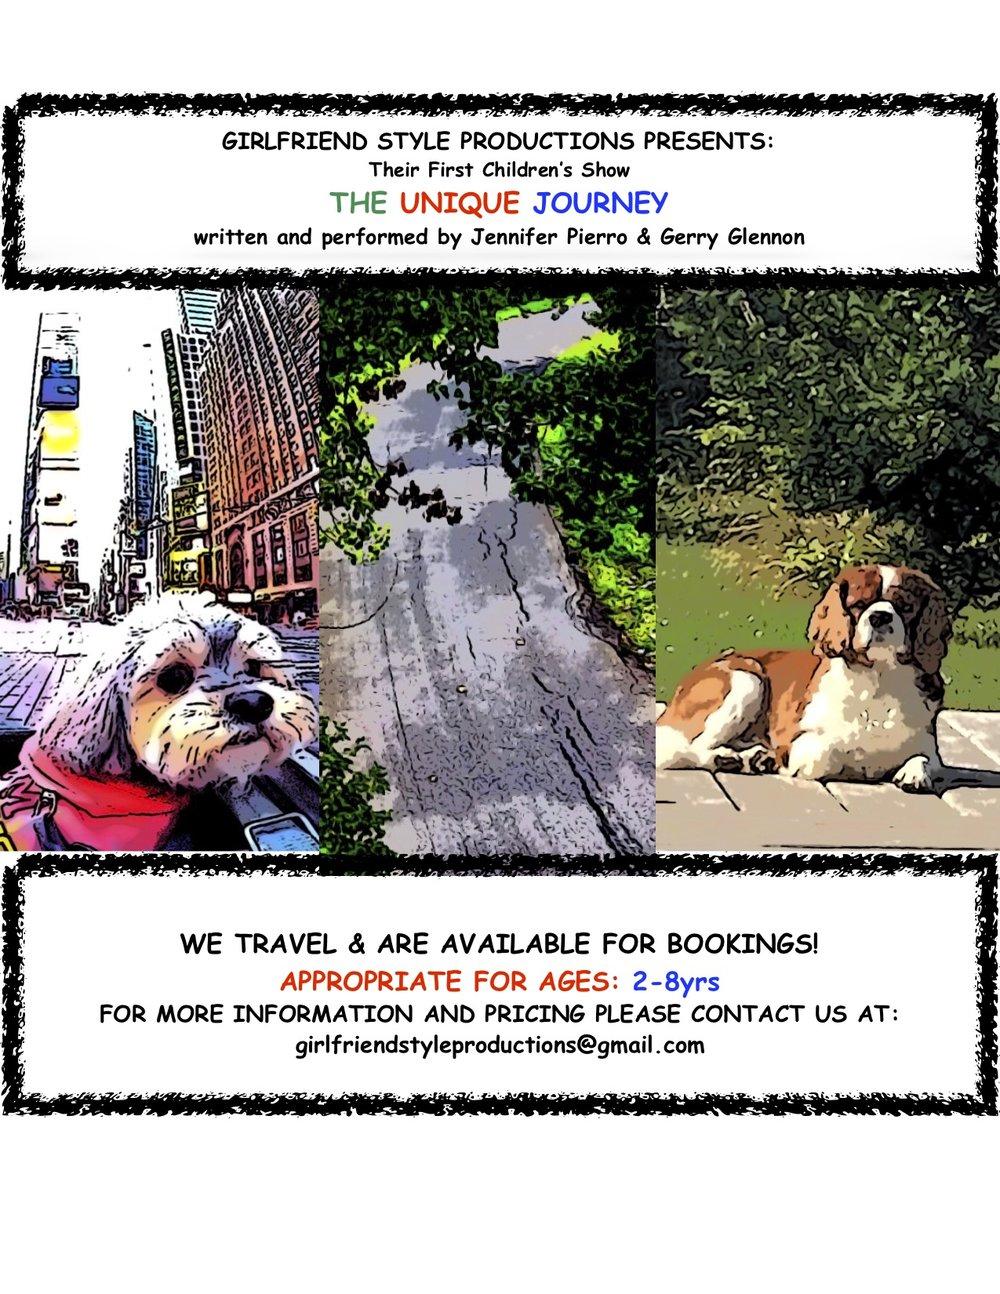 The Unique Journey Bookings Poster FINAL VERSION.JPEG